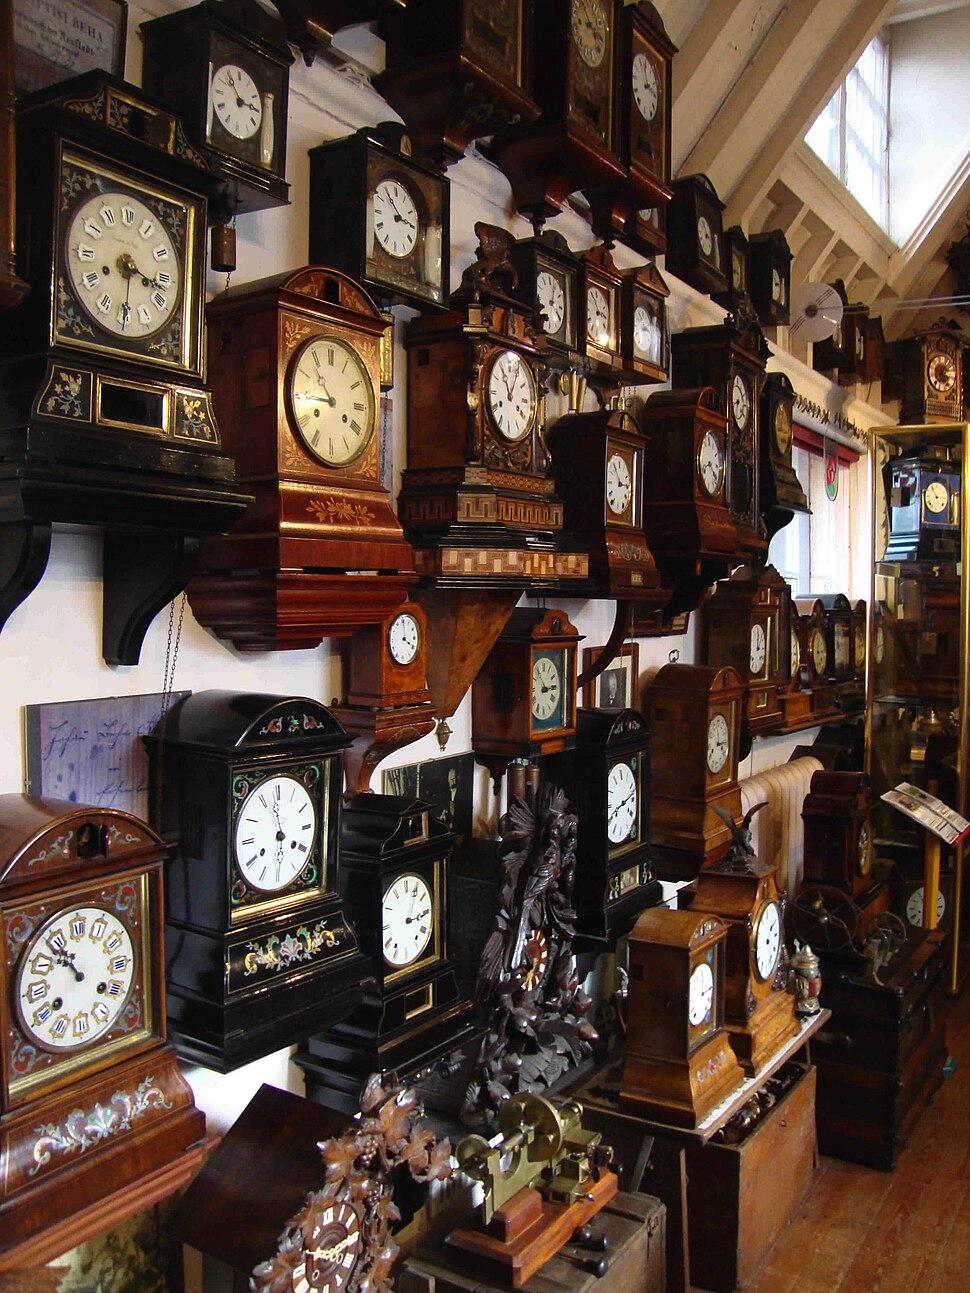 Cuckooland Museum clocks by Kirsty Davies